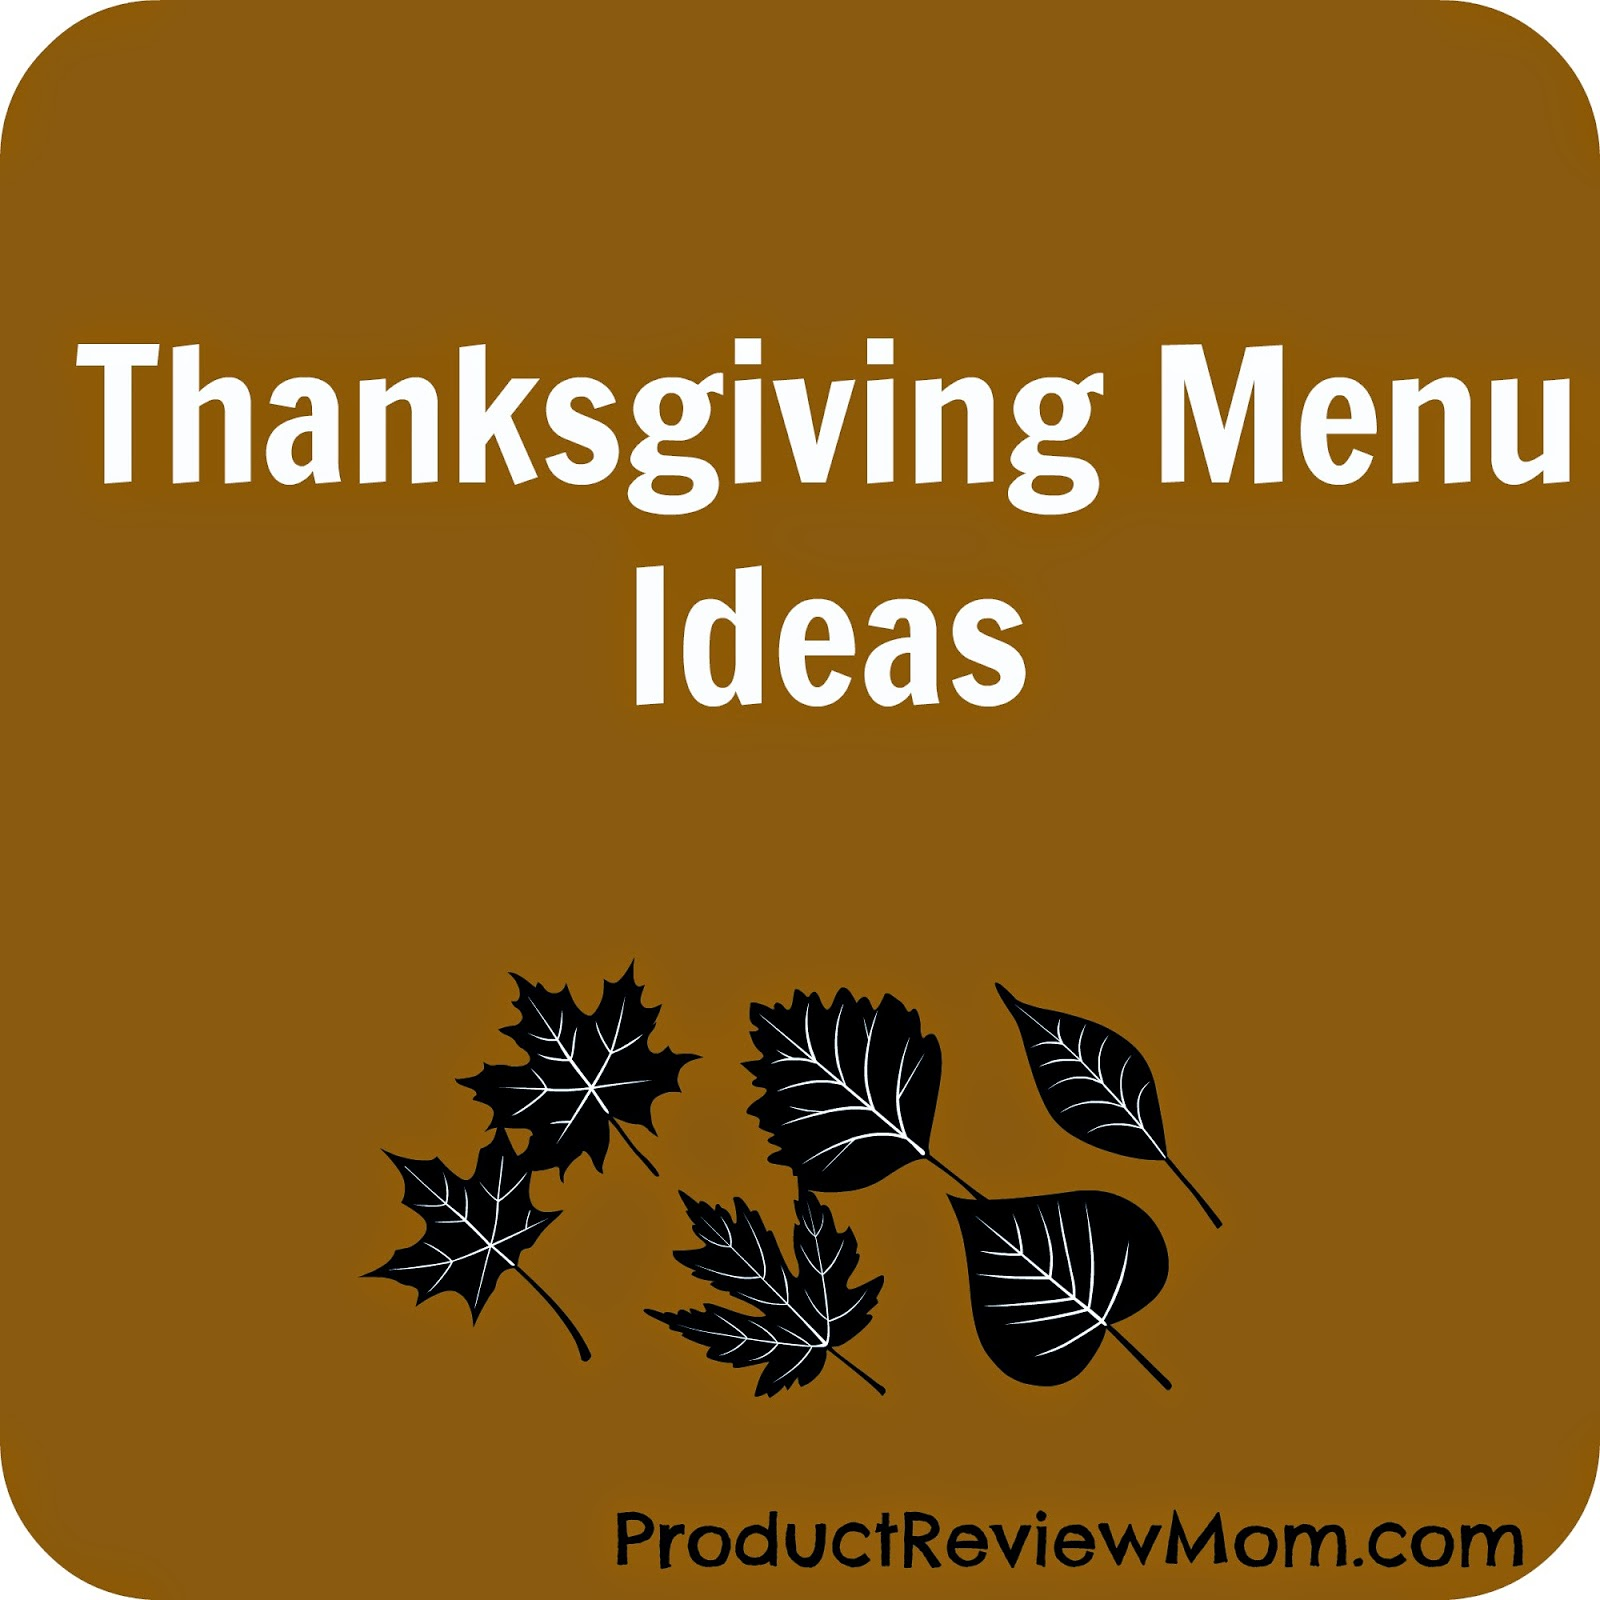 #Thanksgiving Menu Ideas via www.productreviewmom.com